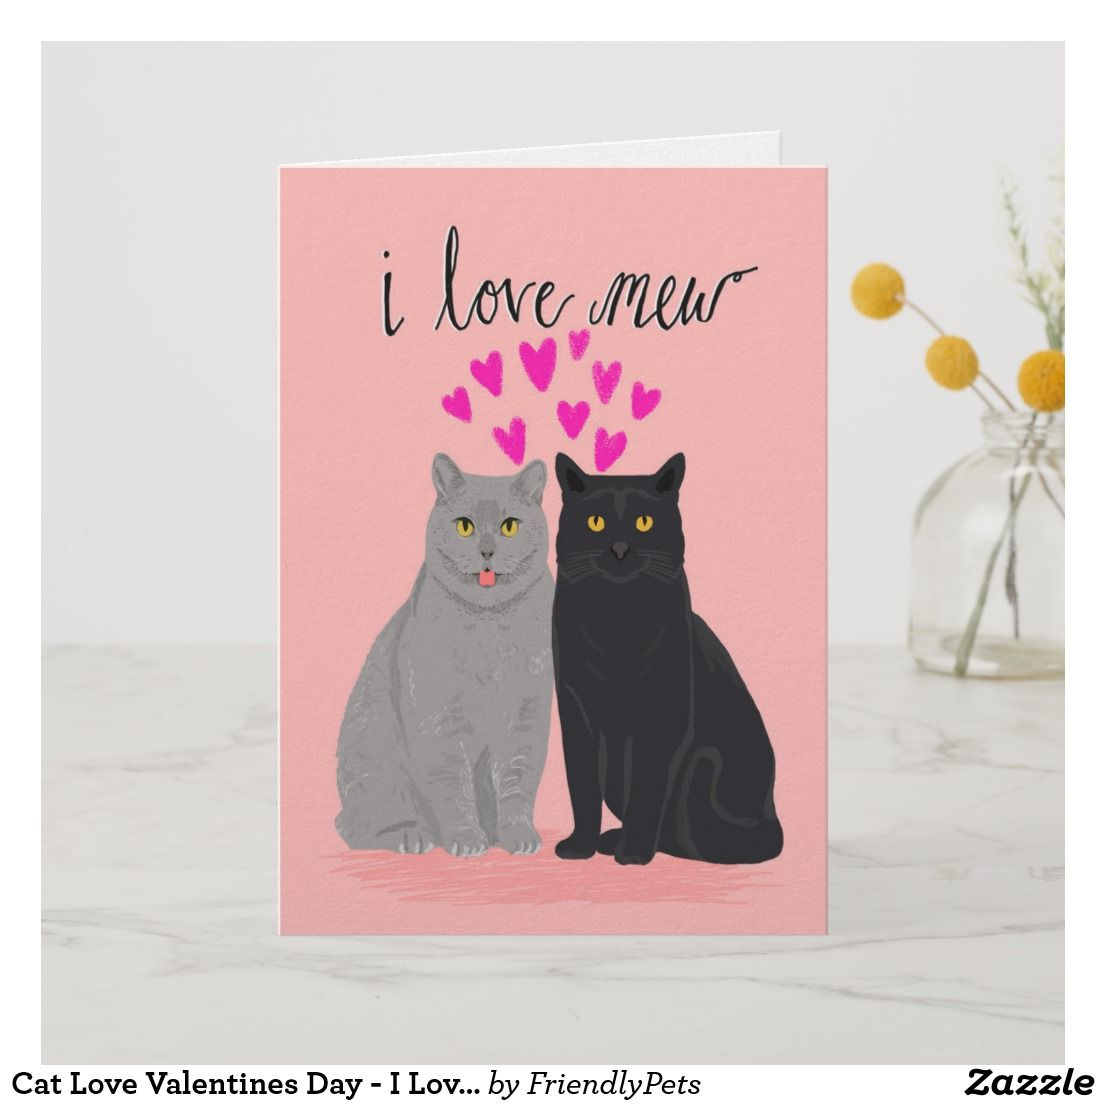 Cat Love Valentines Day I Love Mew Two Cats Card Zazzle Com Cat Cards Cute Valentines Card Cat Valentine